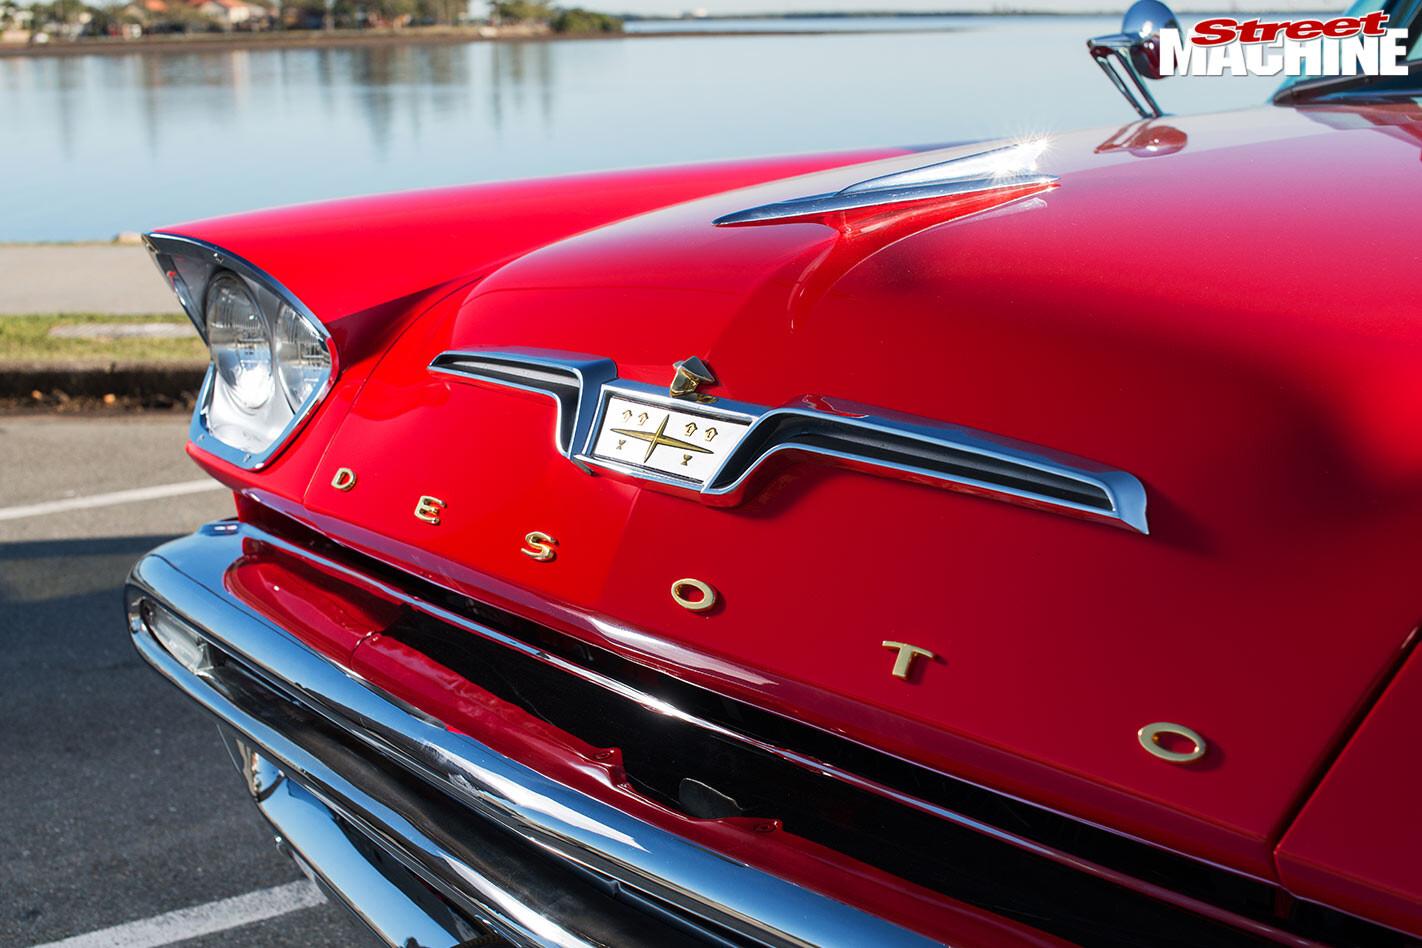 1957 DeSoto Fireflite front